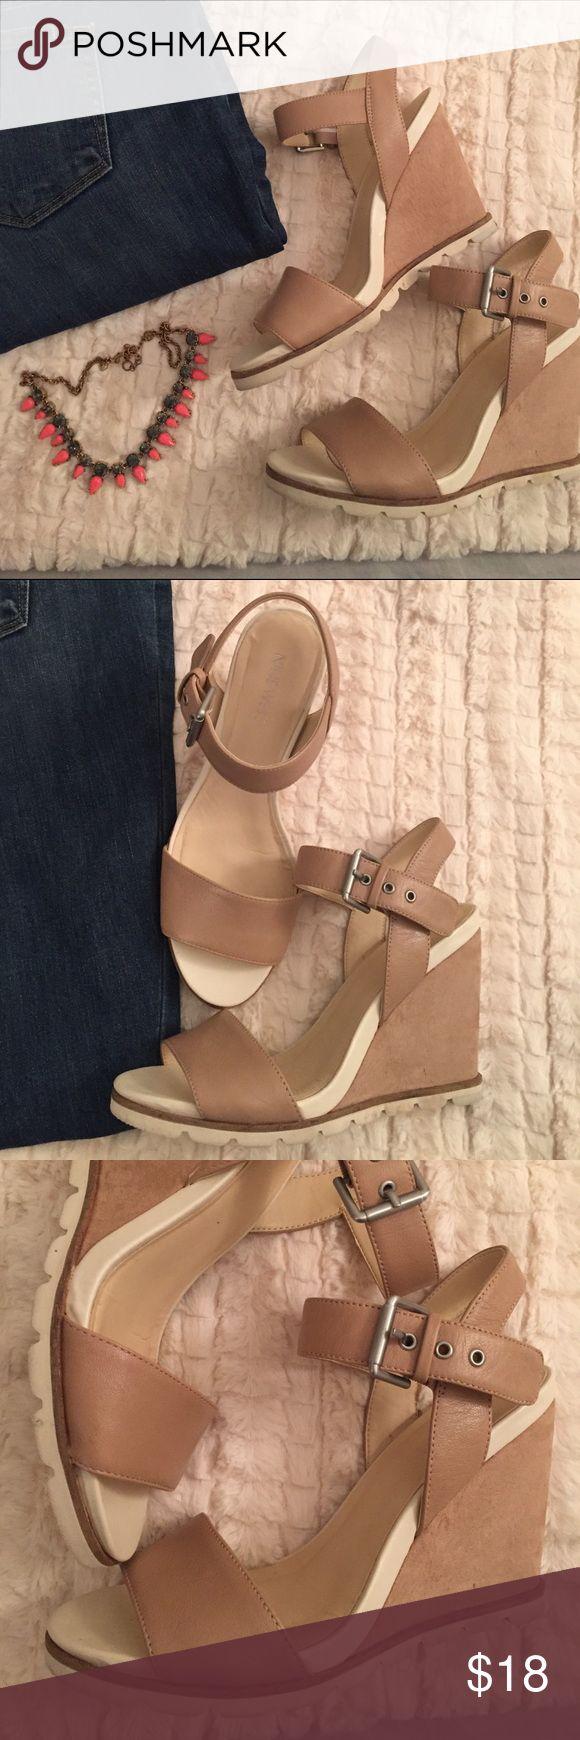 Nine West Wedge Neutral Sandals Excellent Condition. Beautiful neutral sandal. Nine West Shoes Sandals